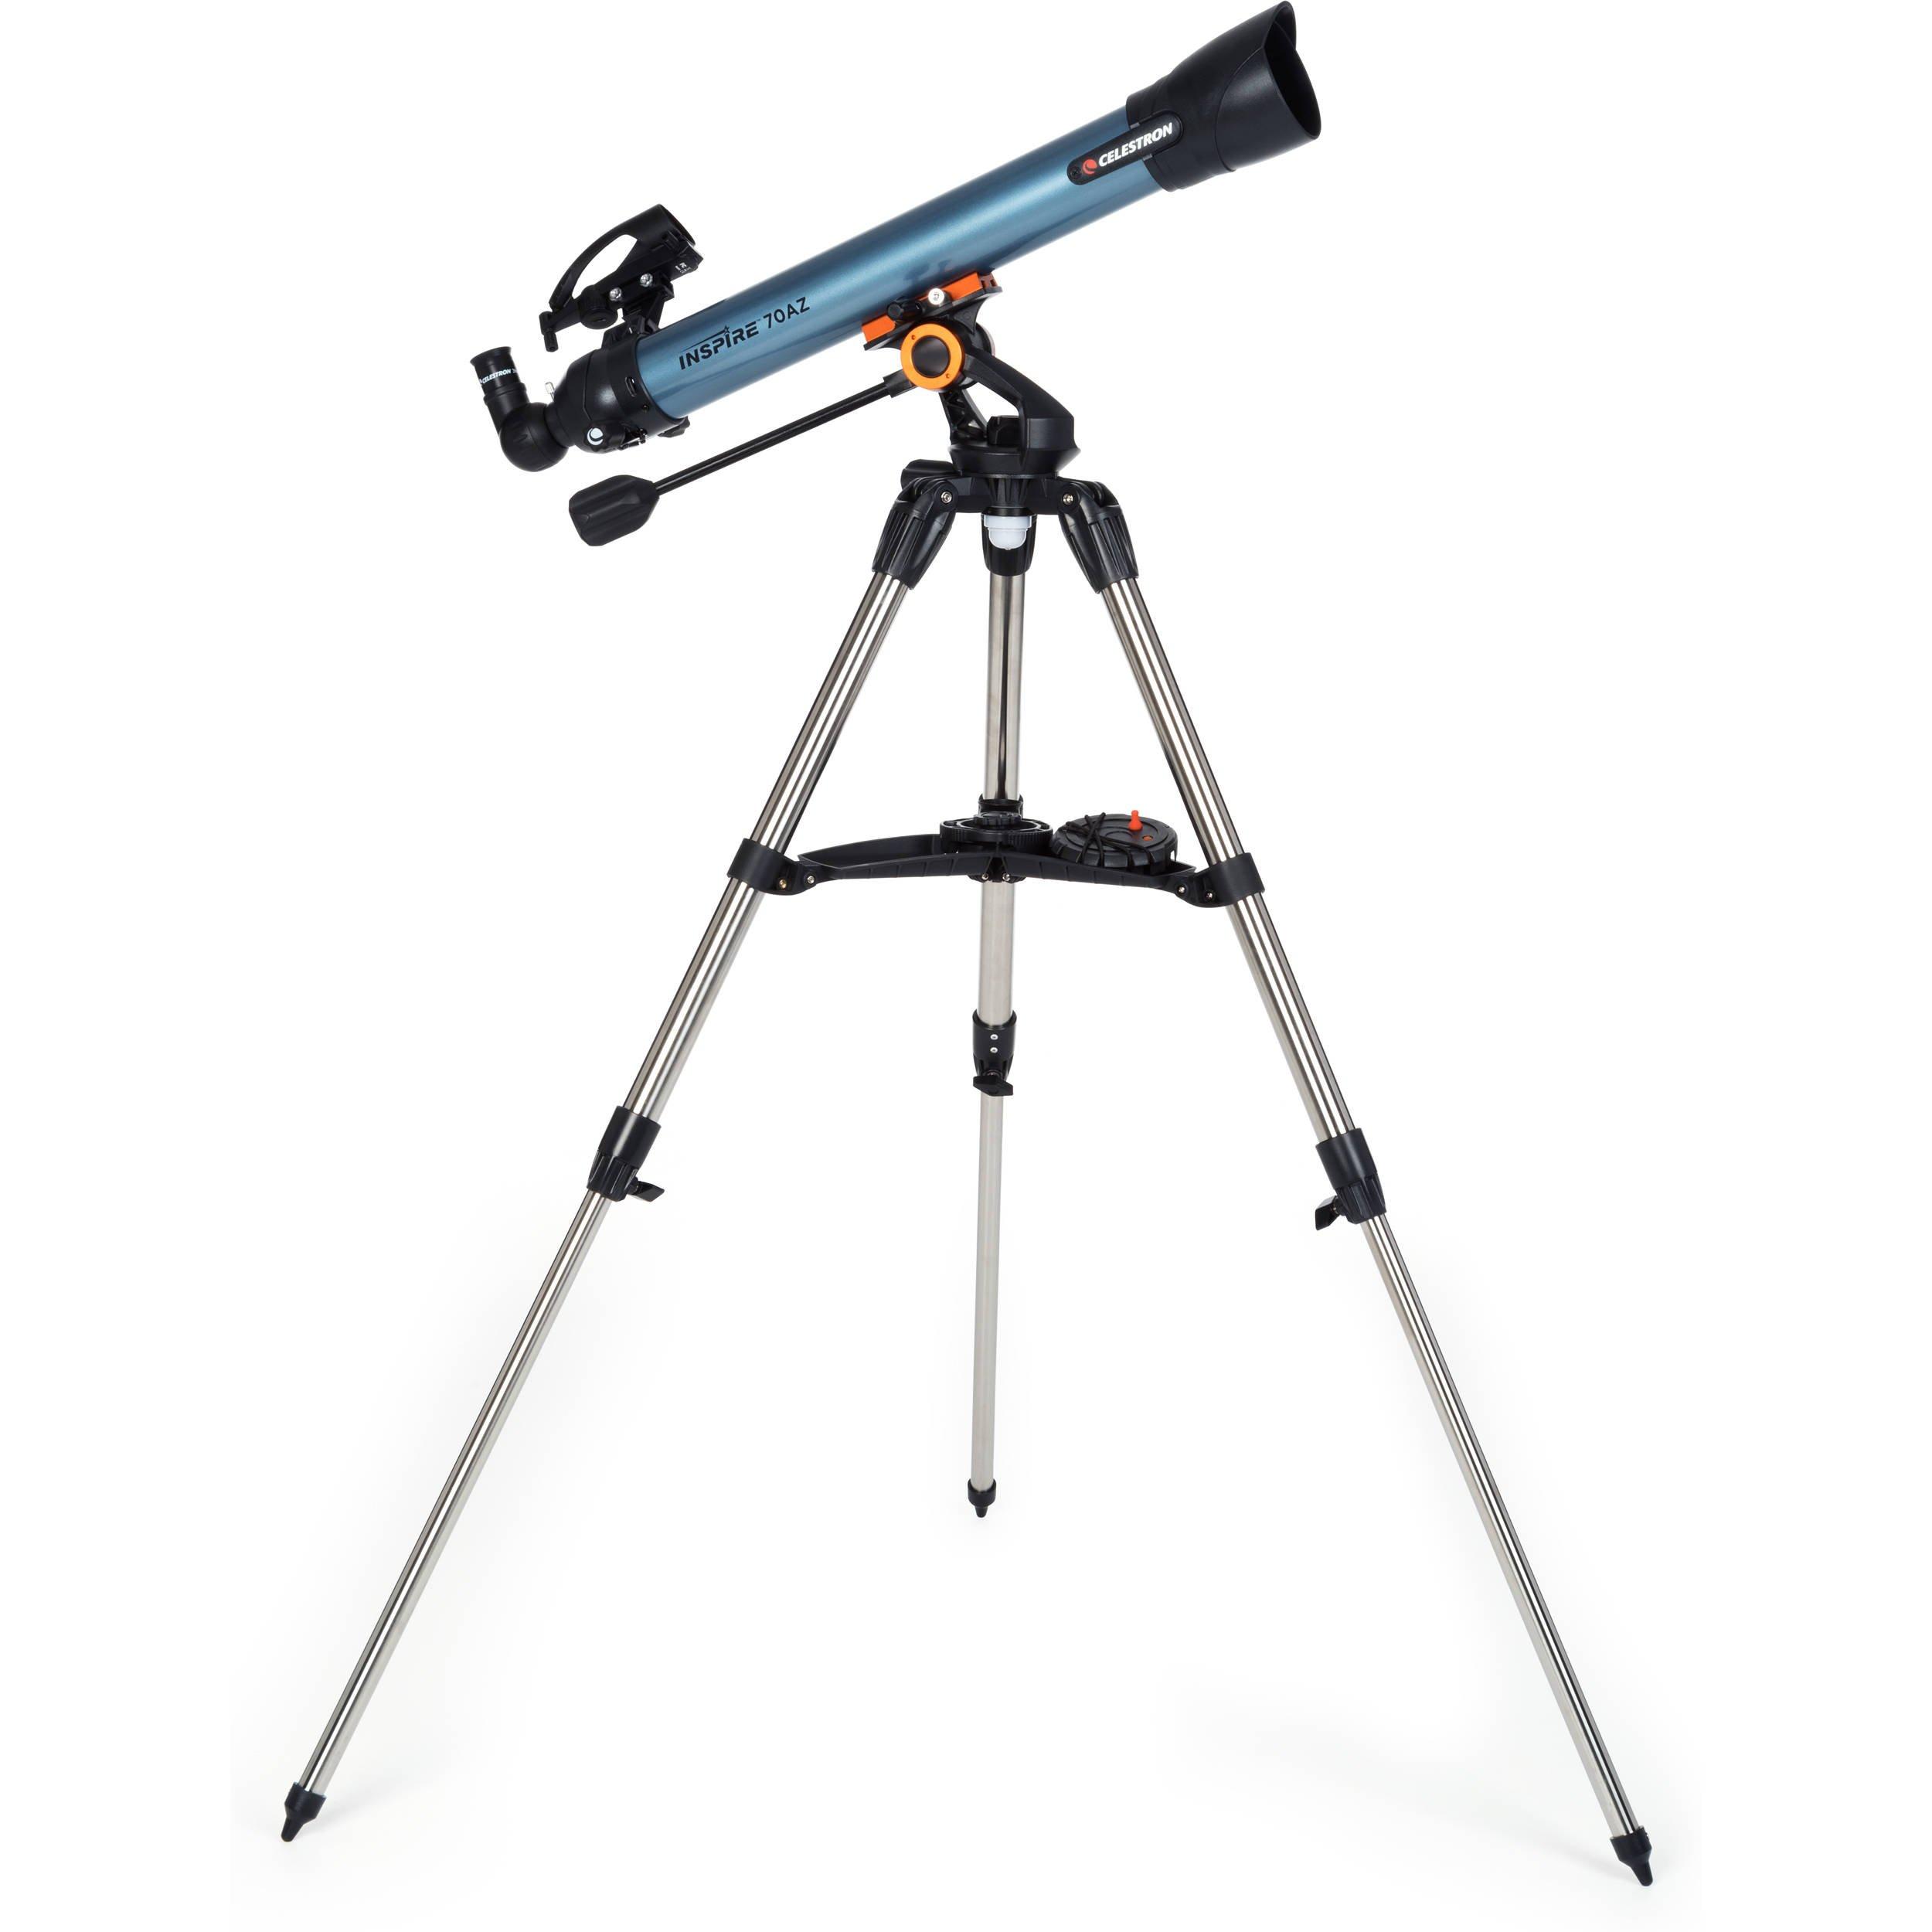 Celestron Inspire 70AZ Refractor Telescope Review